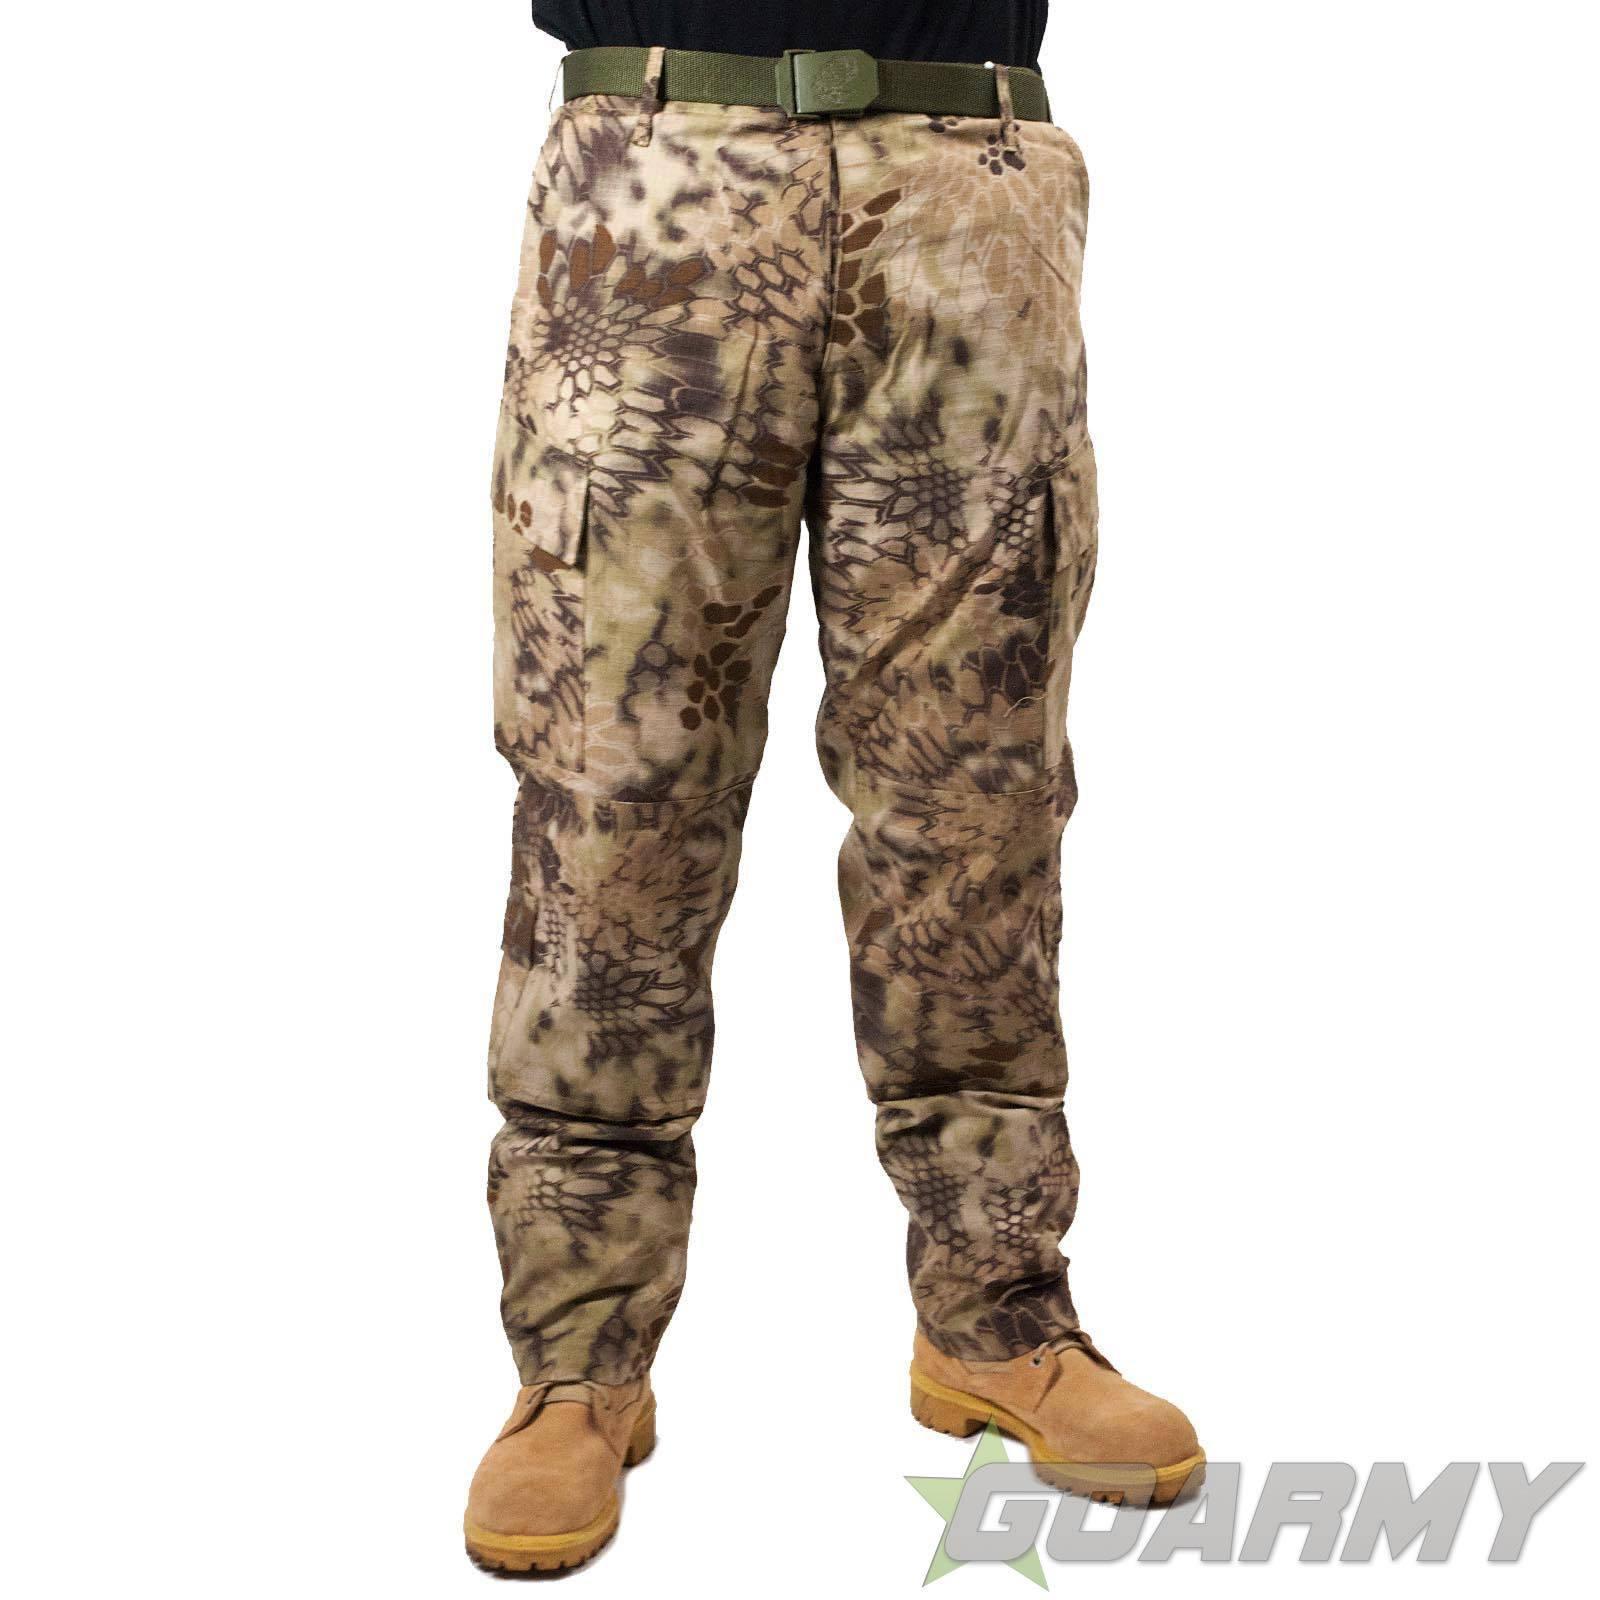 Mil-Tec Kryptek Style Camo Trousers Highlander